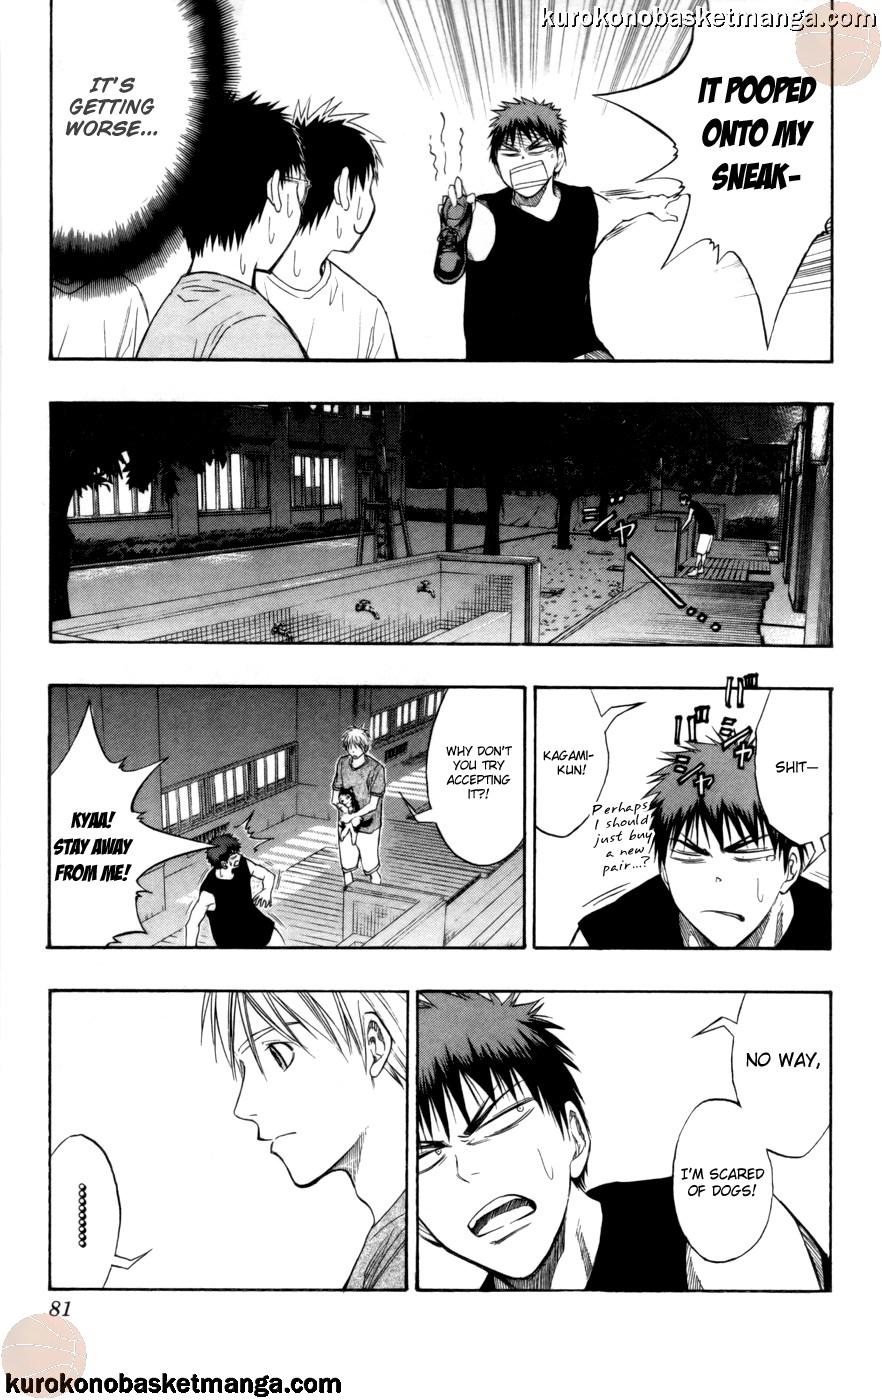 Kuroko no Basket Manga Chapter 74 - Image 15